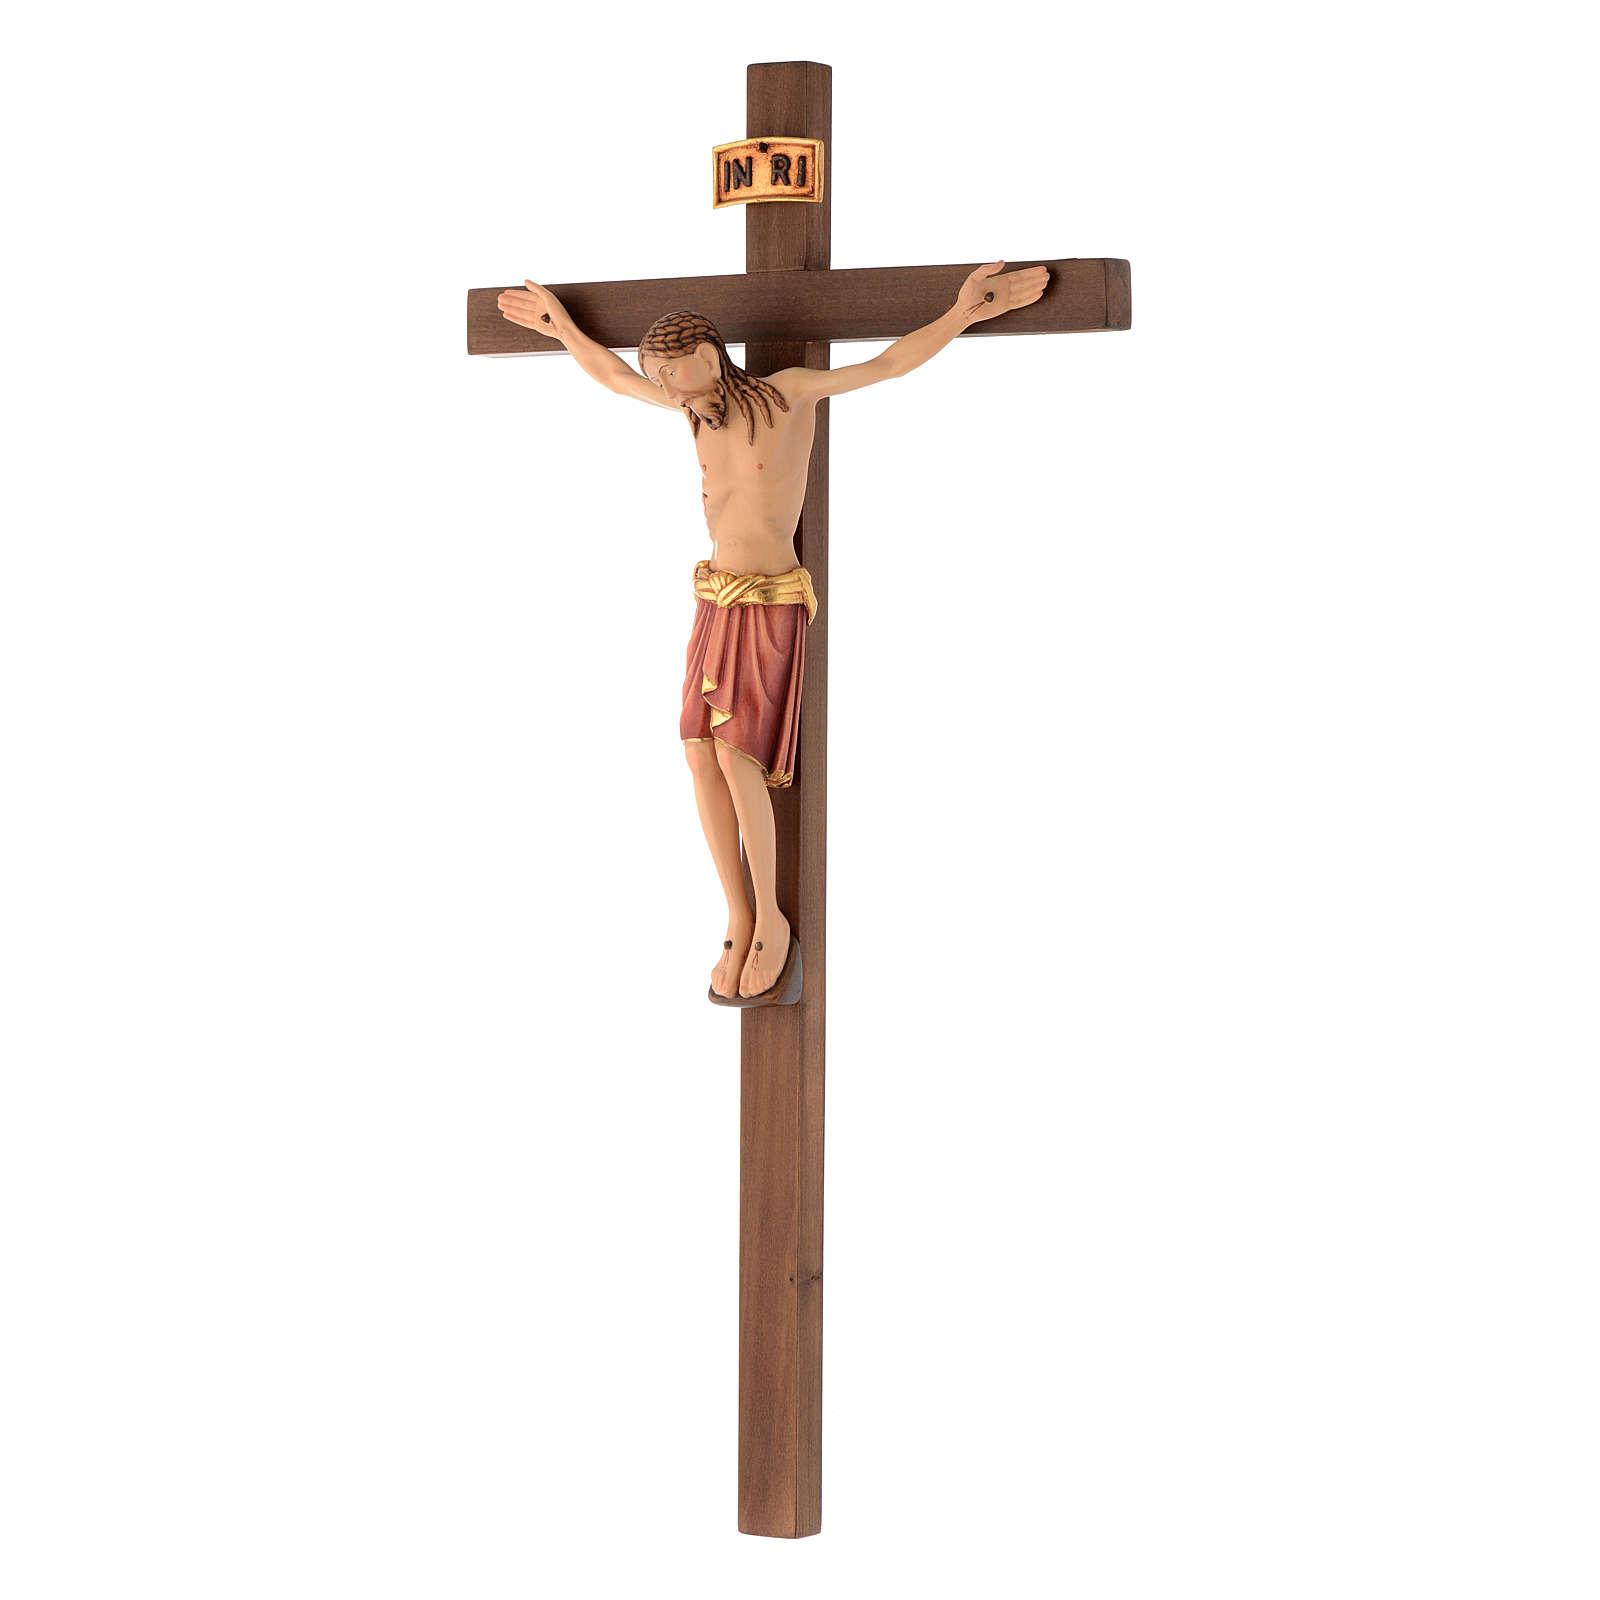 Wooden crucifix, Saint Damien style body of Christ 4